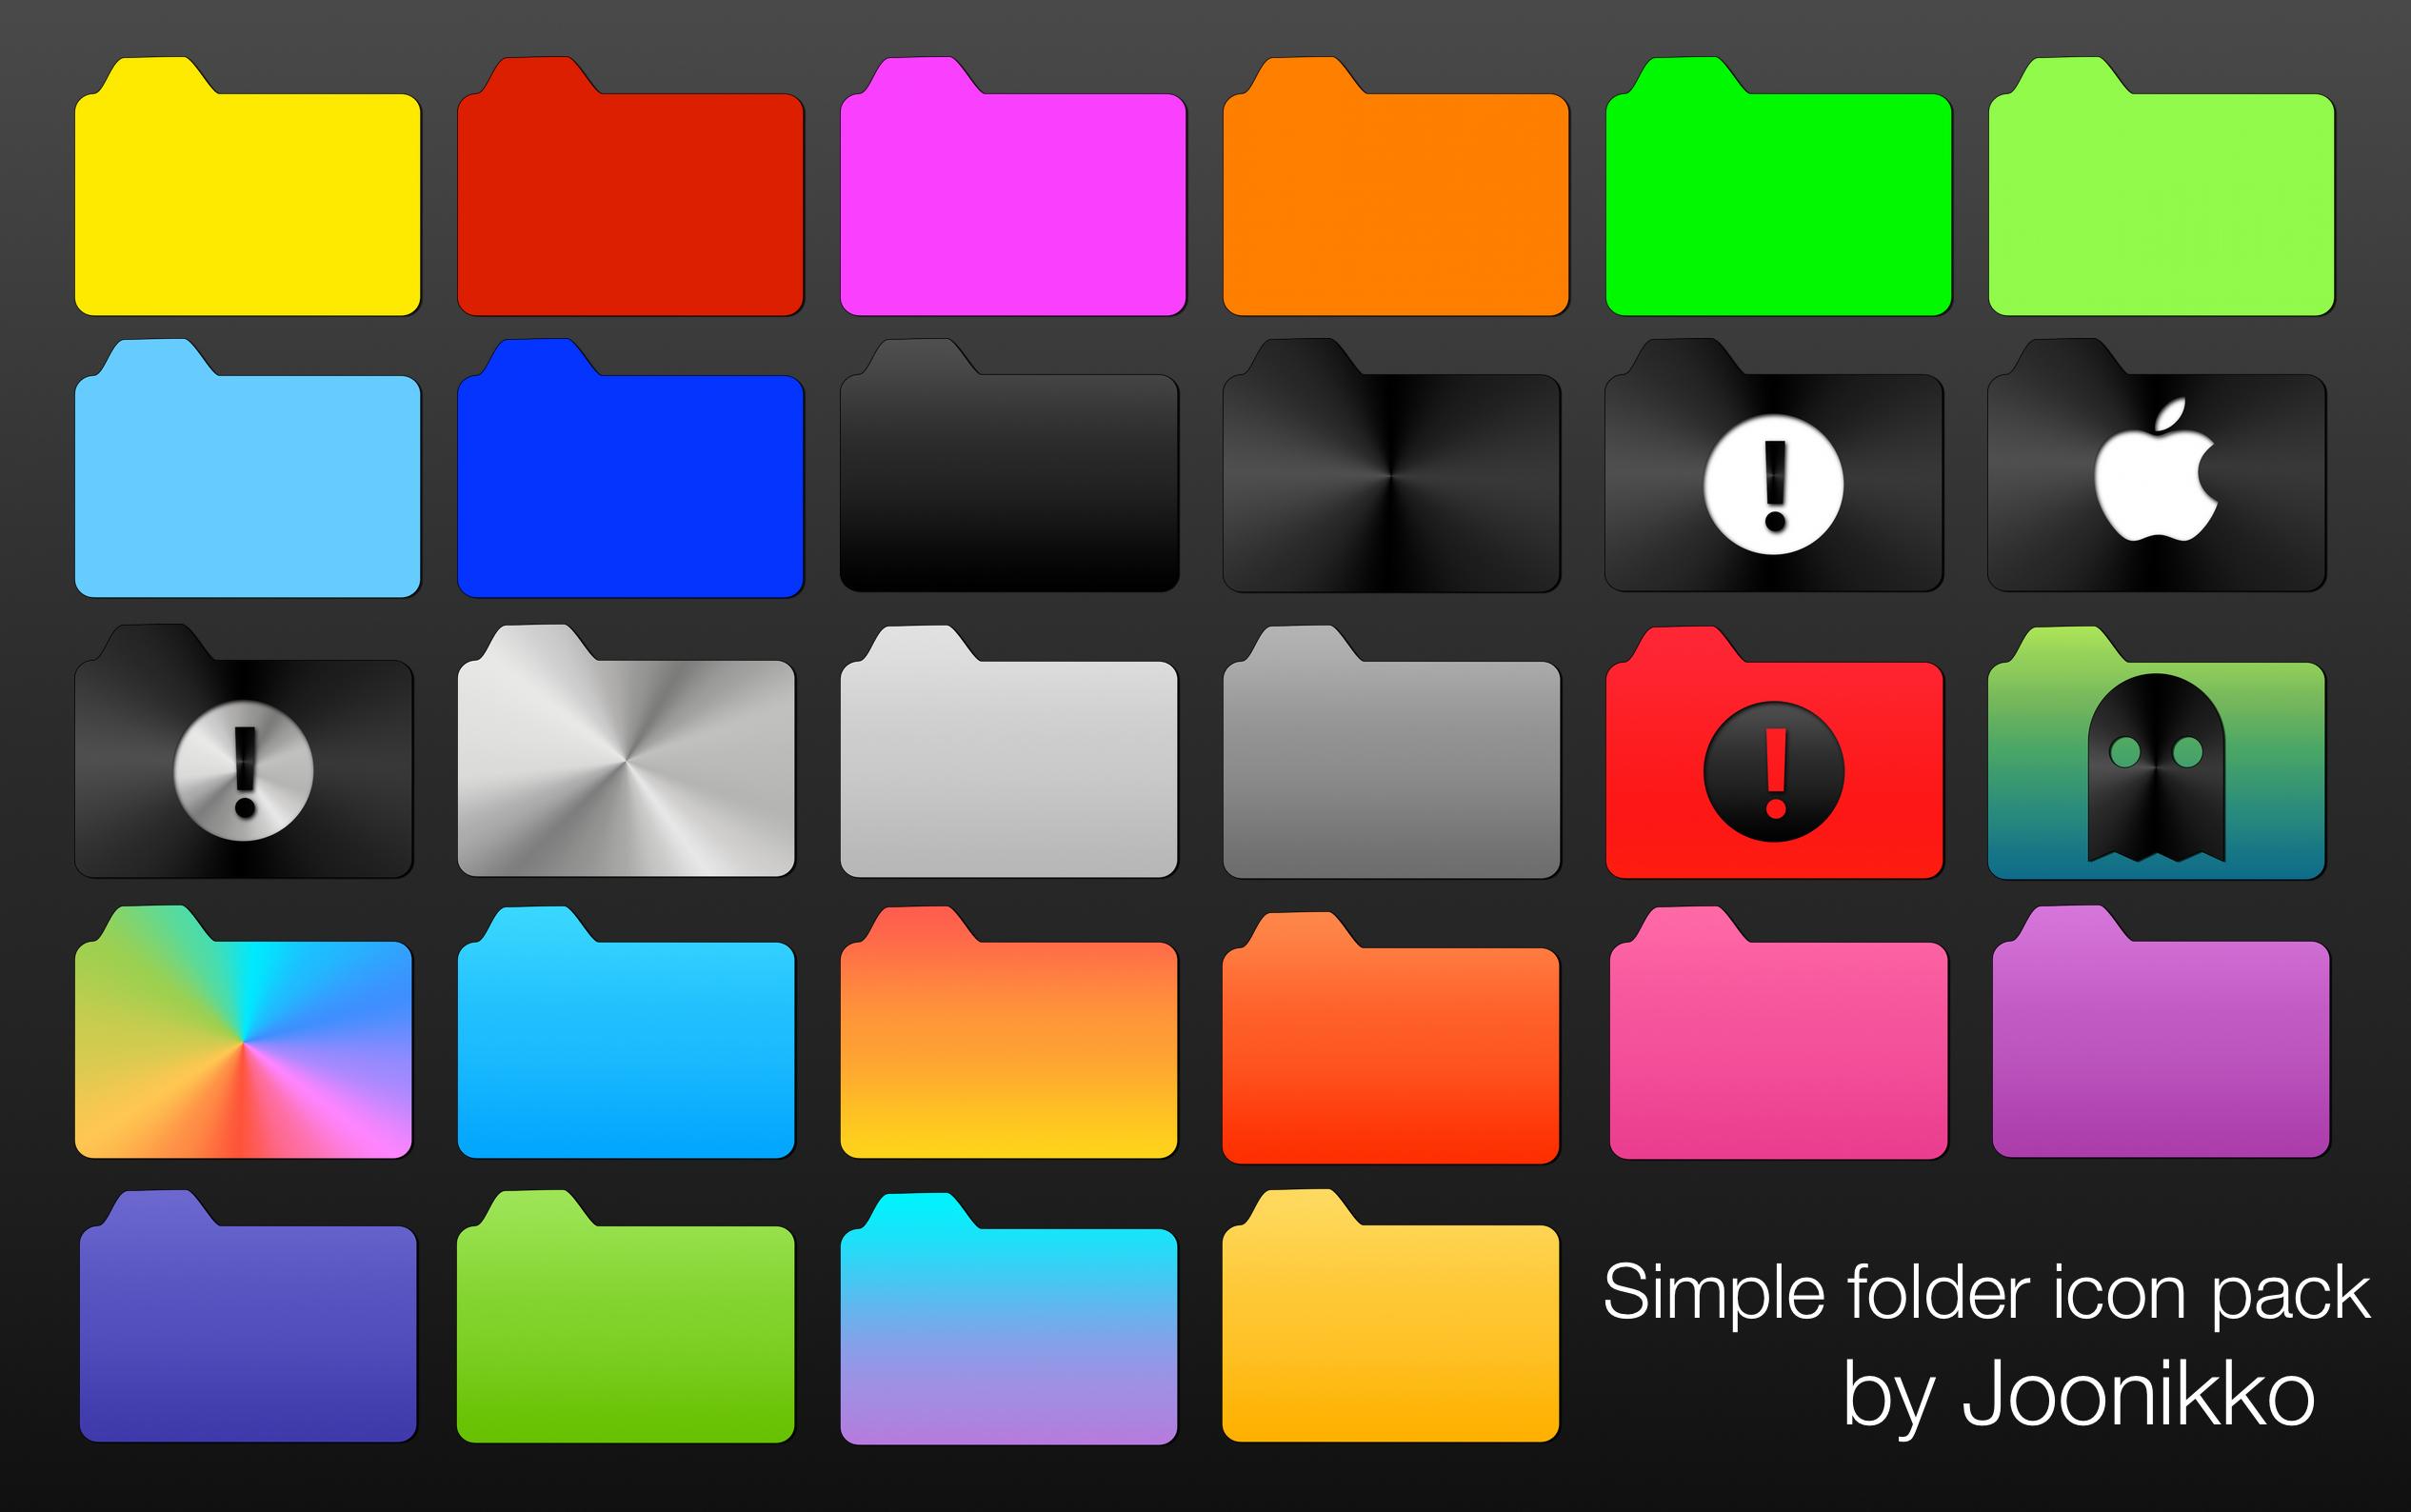 Simple folder icon pack by Joonikko on DeviantArt